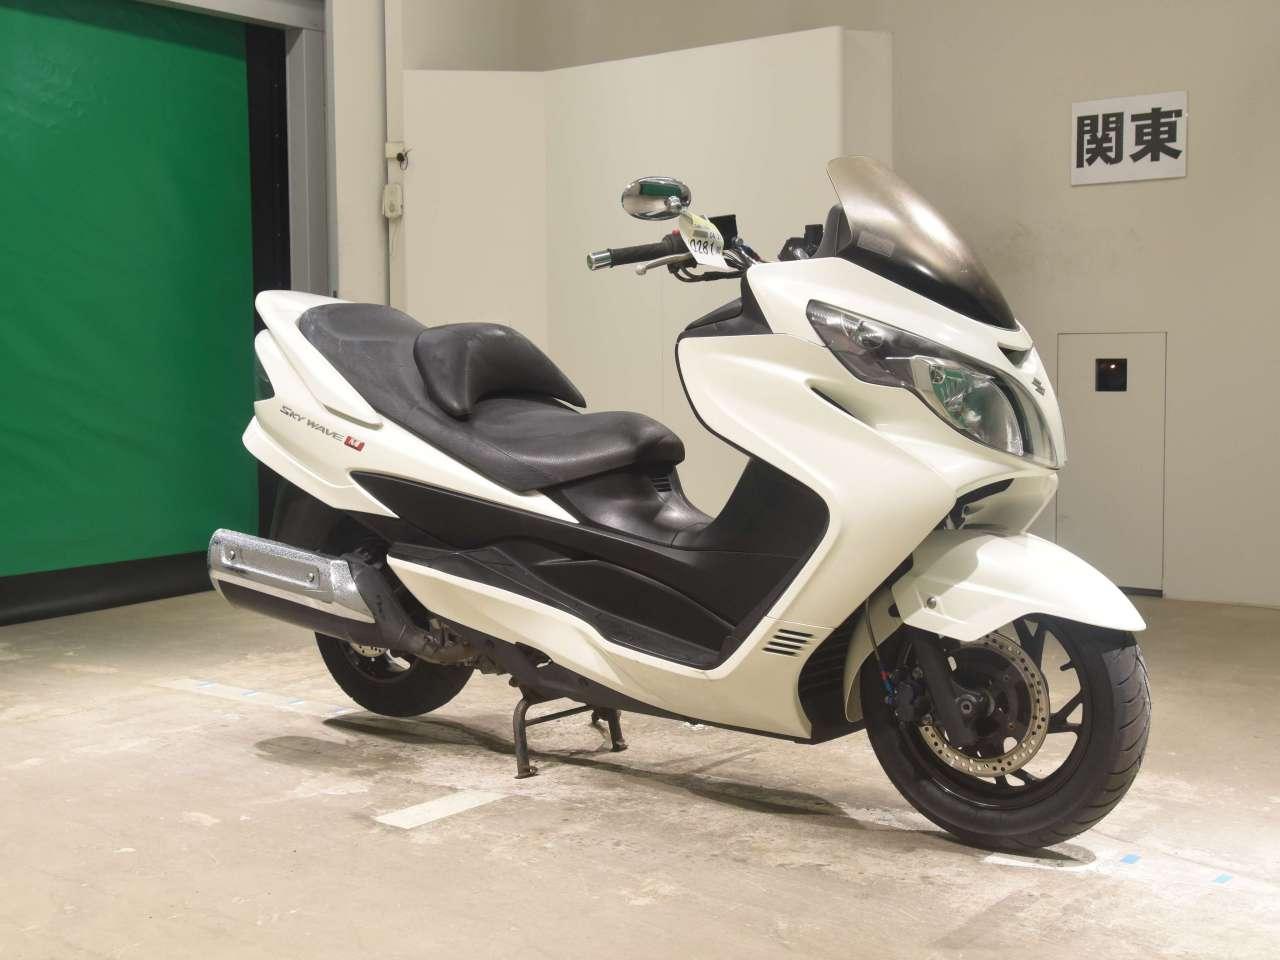 МАКСИ-СКУТЕР SUZUKI SKYWAVE 250M CJ45A  Артмото - купить квадроцикл в украине и харькове, мотоцикл, снегоход, скутер, мопед, электромобиль